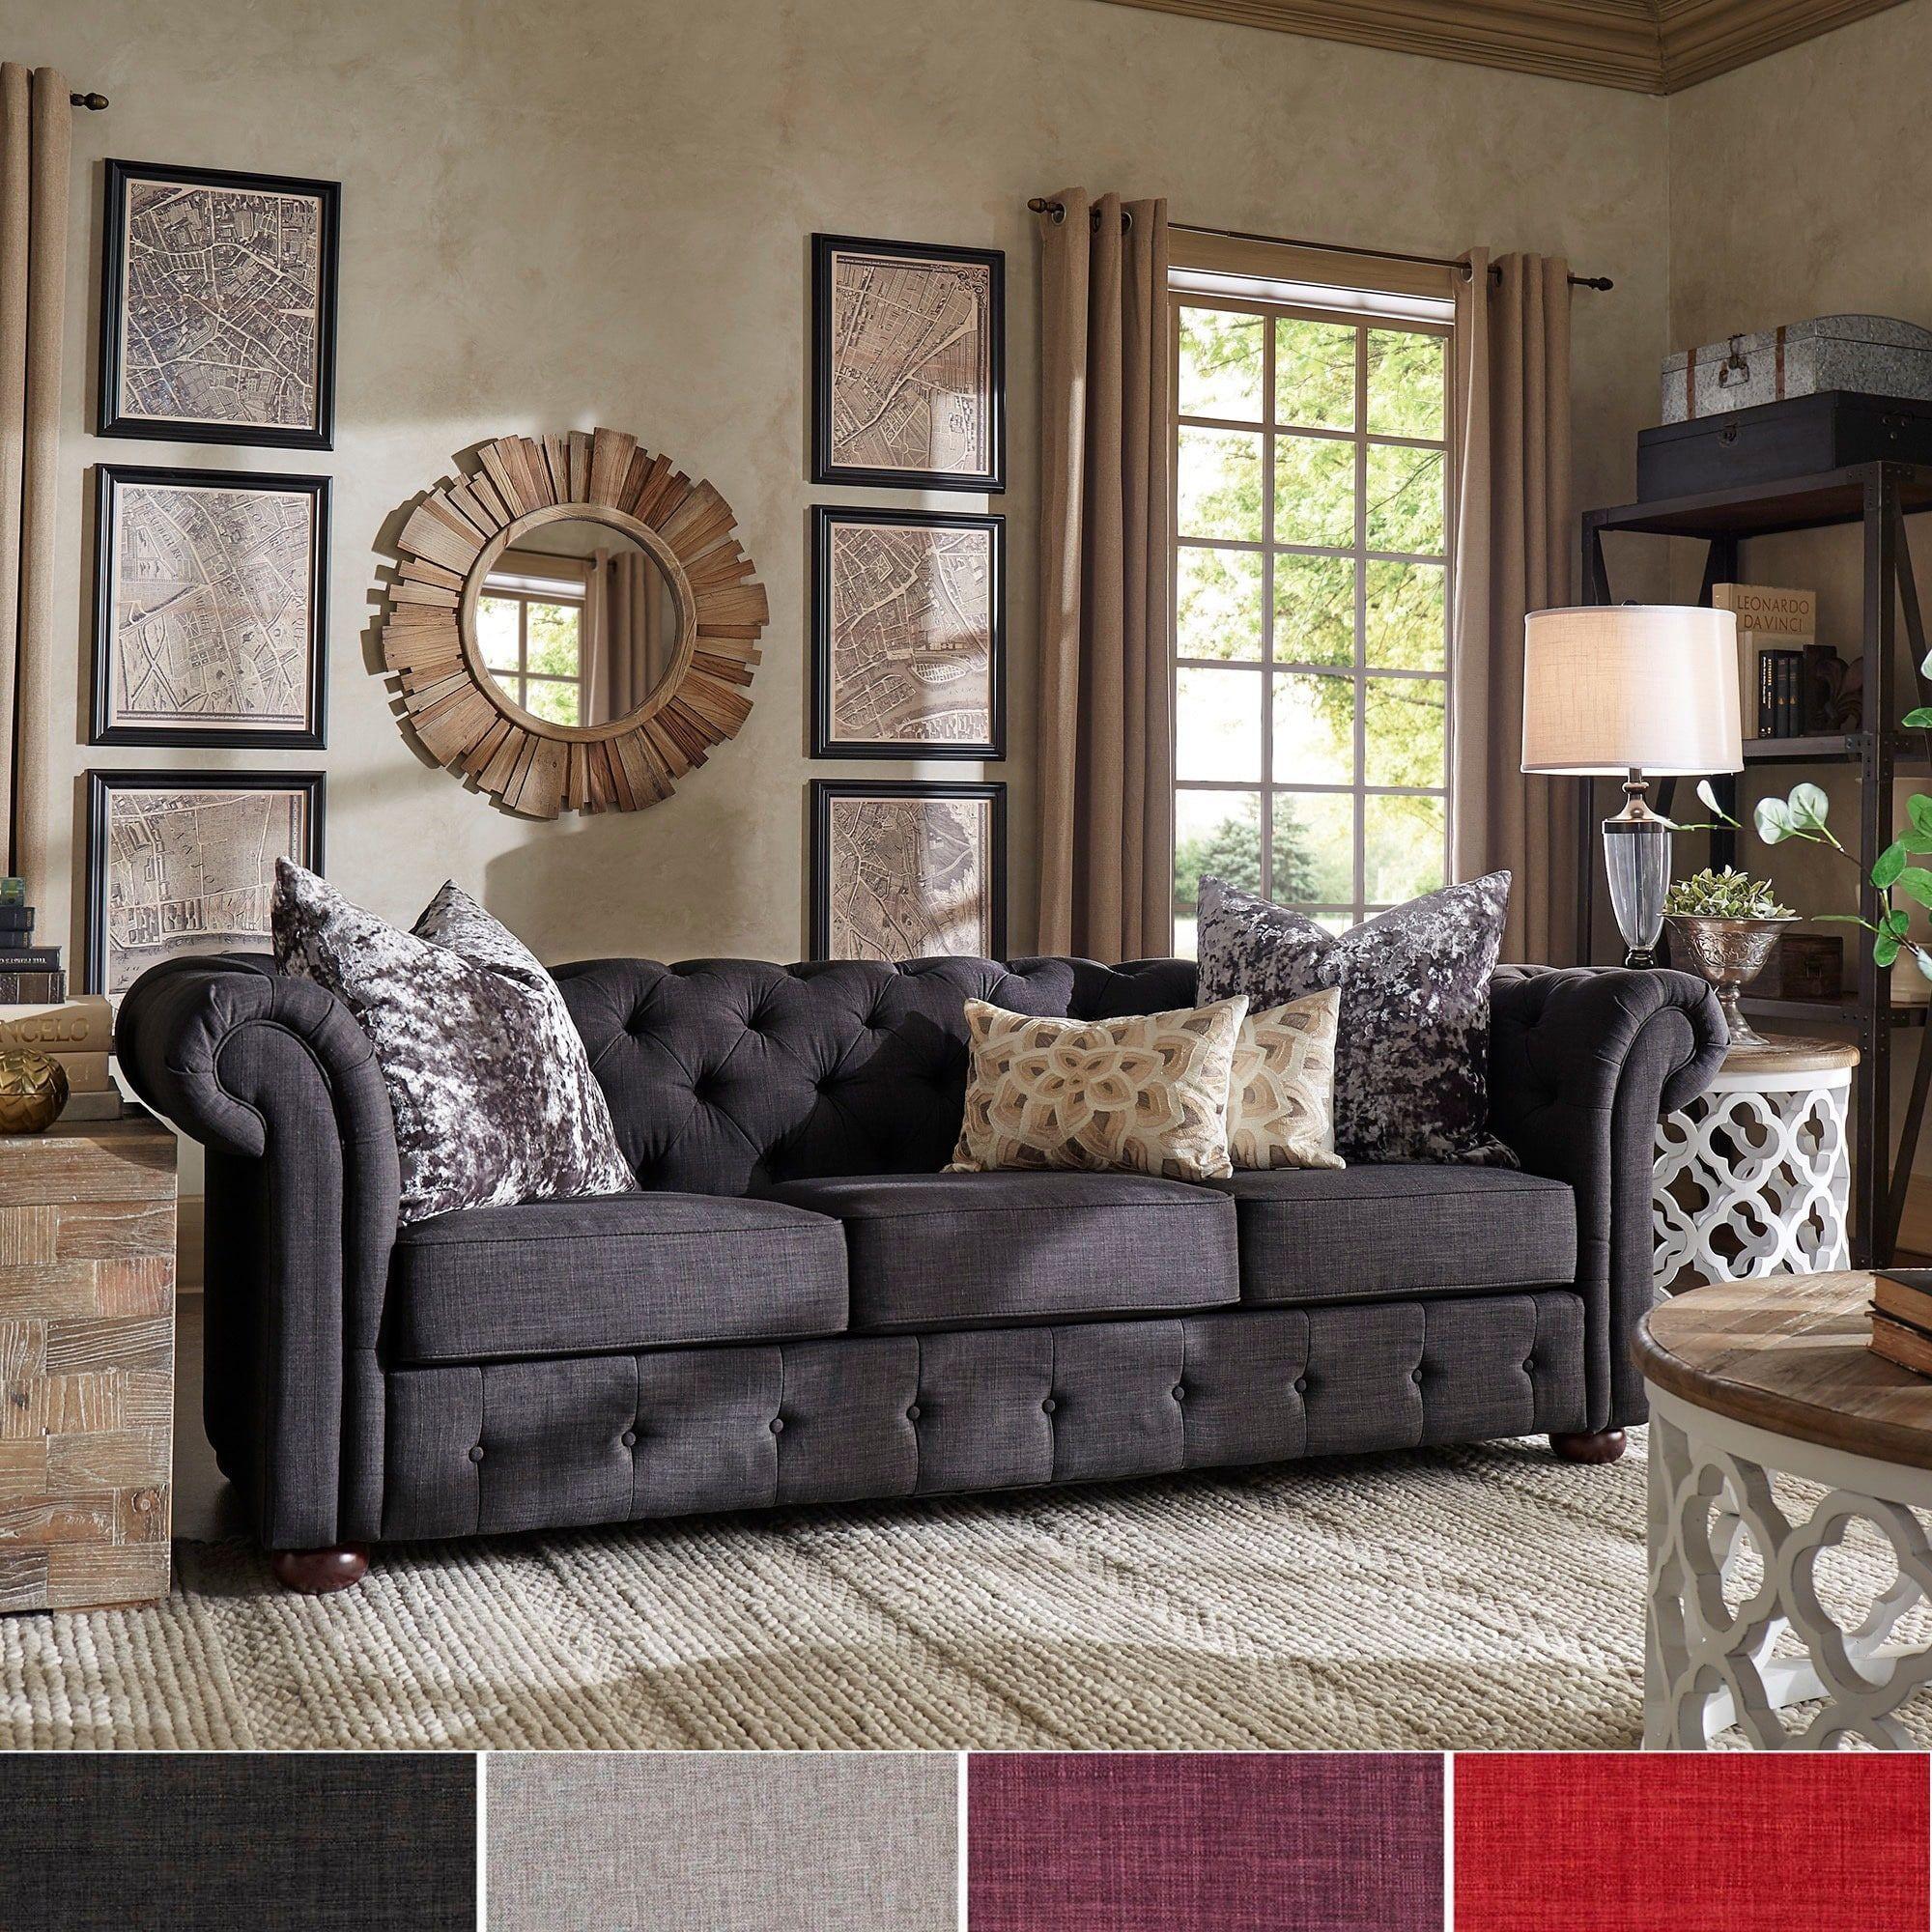 Knightsbridge Tufted Scroll Arm Chesterfield Sofa by iNSPIRE Q Artisan  (Dark Grey Linen Sofa), Black (Fabric)